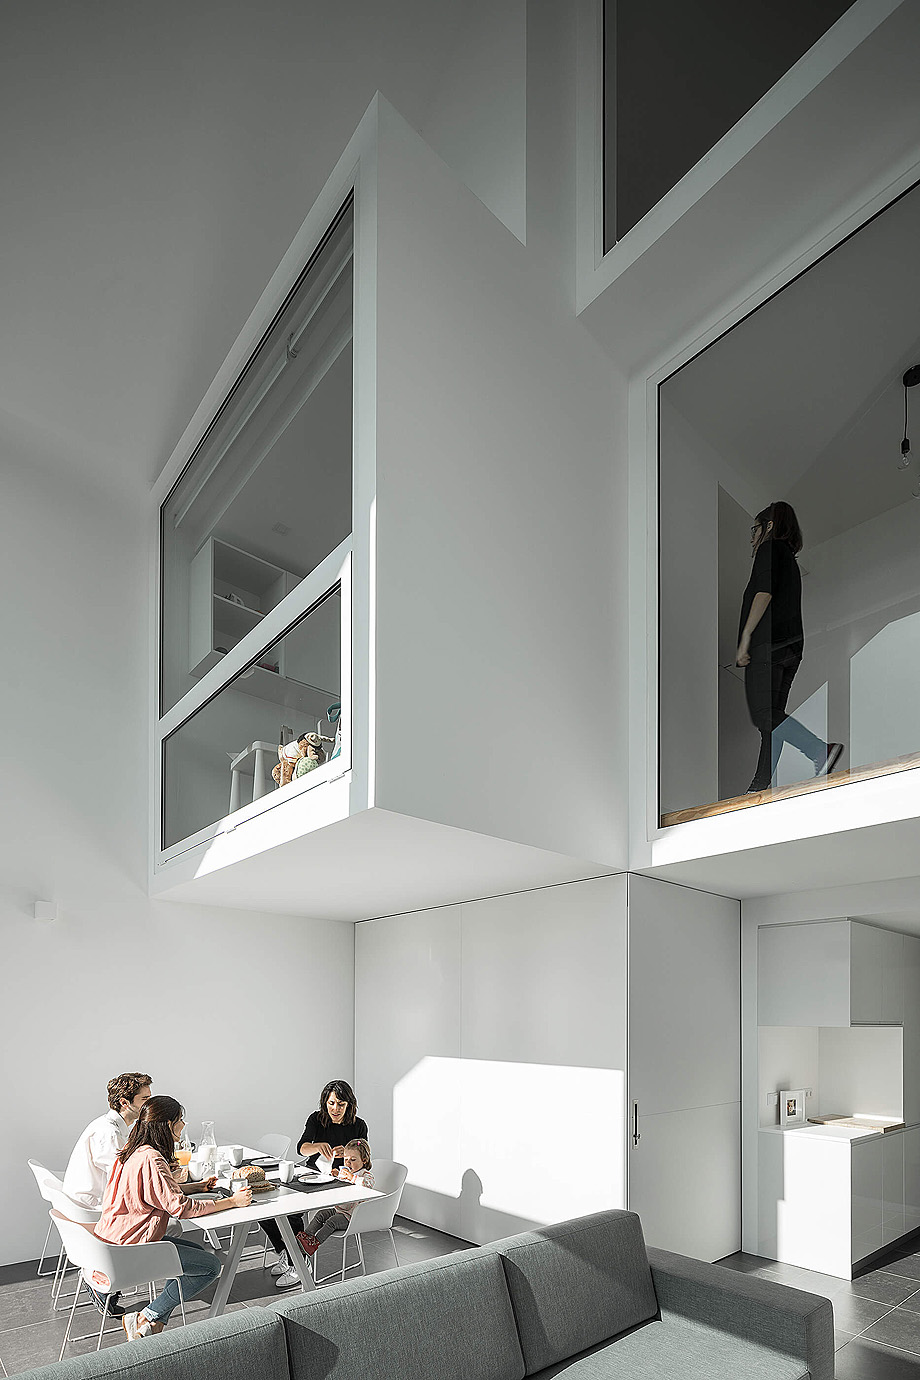 casa do arco de frari architecture network - foto ivo tavares (7)